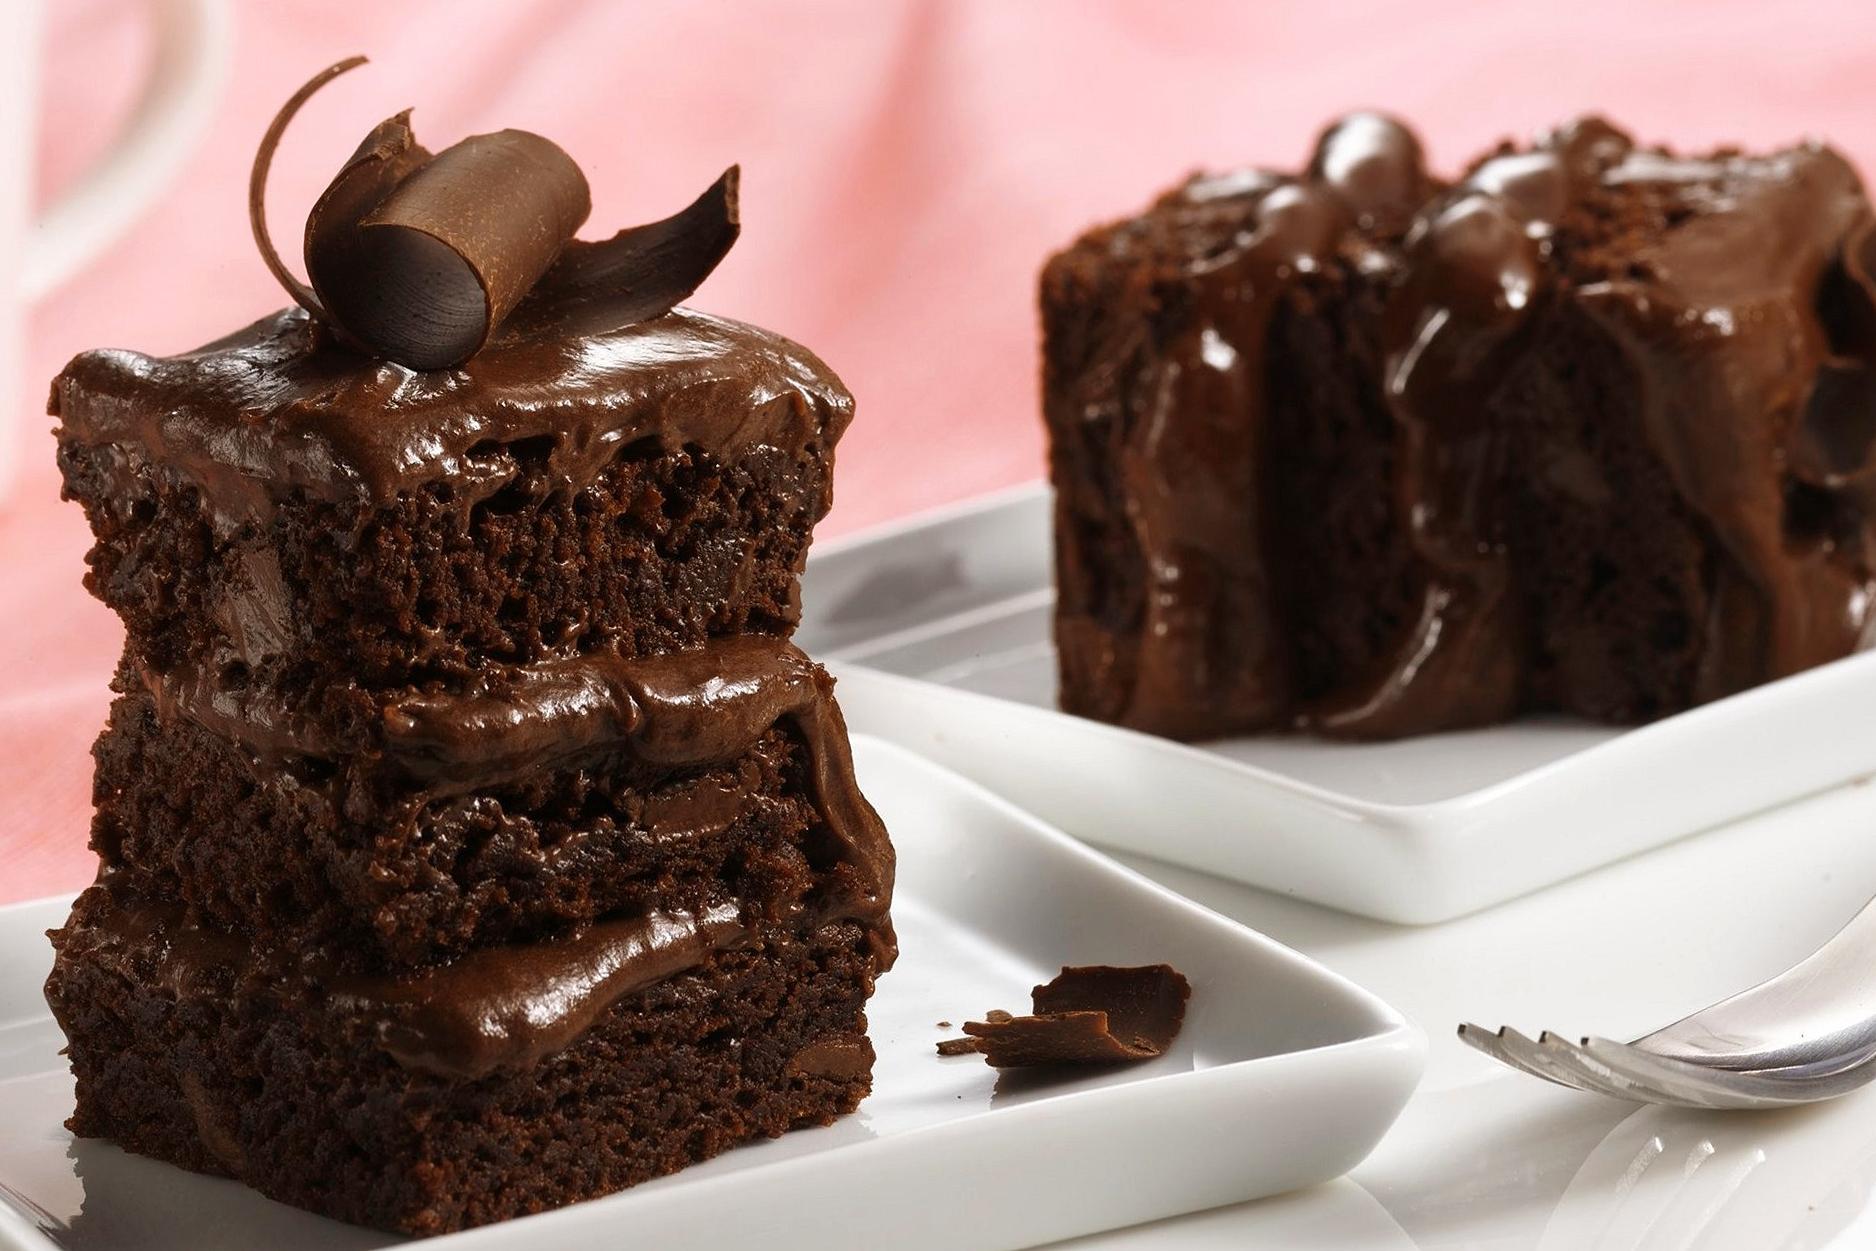 рецепт шоколадного брауни с фото пошагово